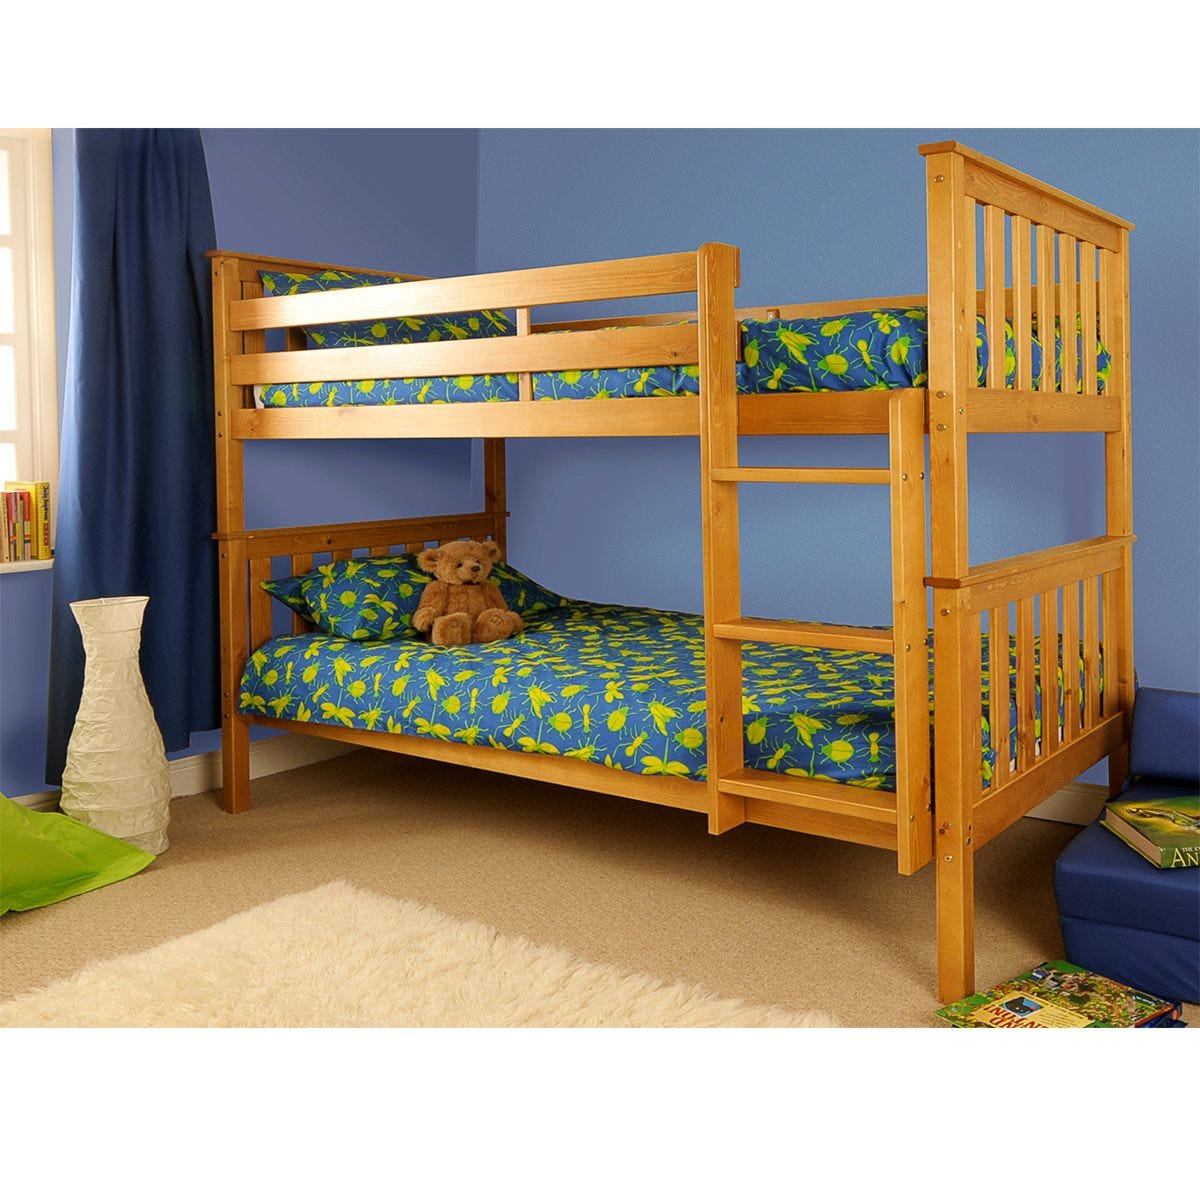 Chelsea Single Bunk Bed - Caramel